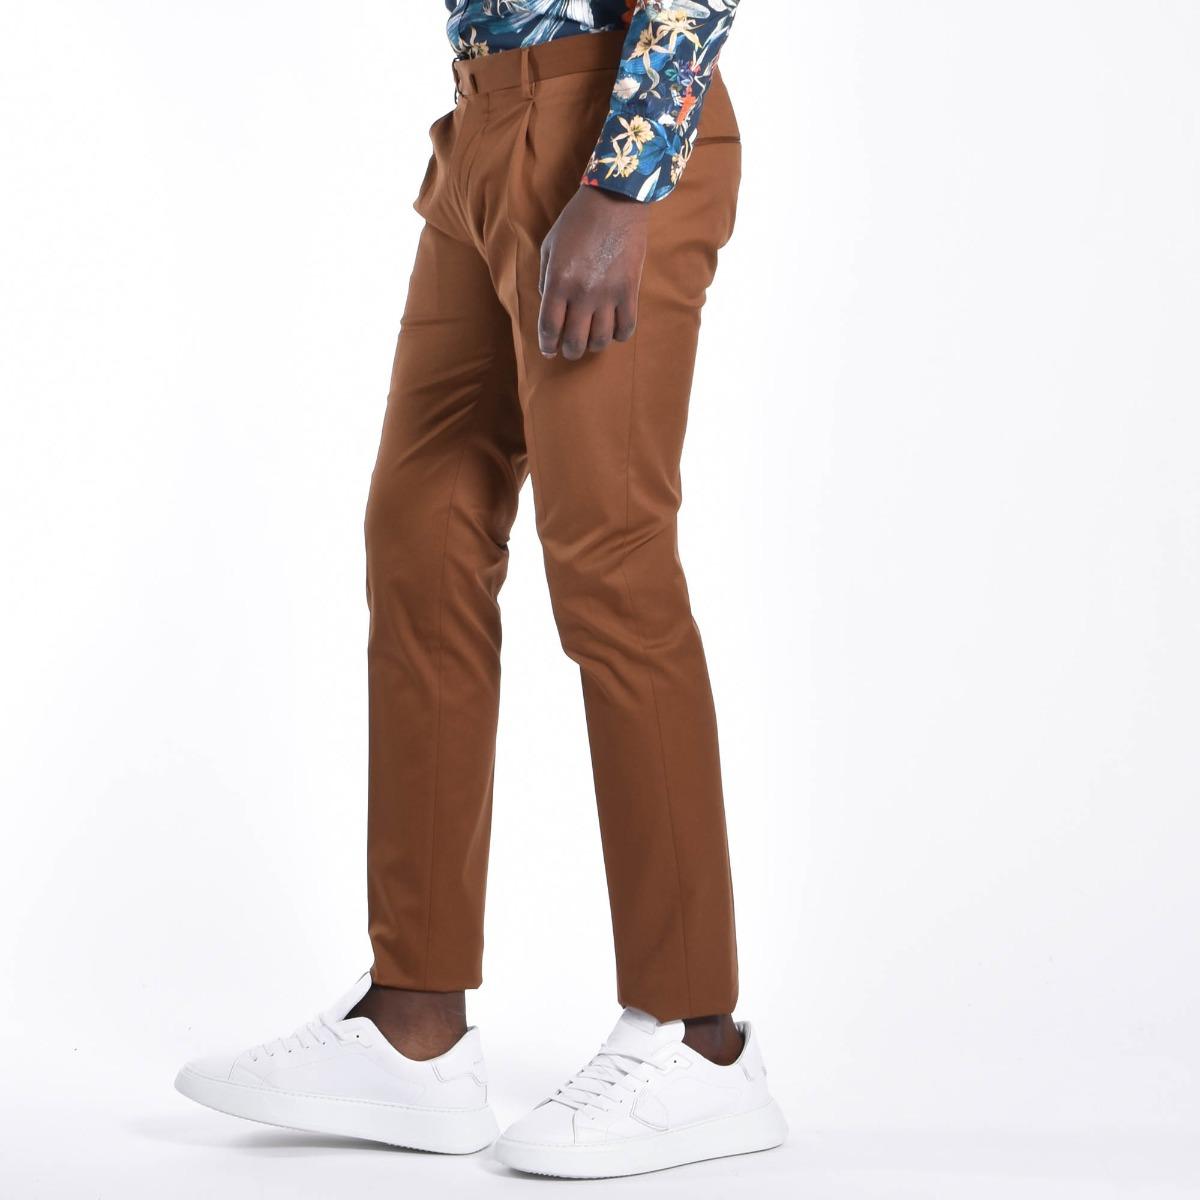 Pantalone pattina e pences - Tabacco